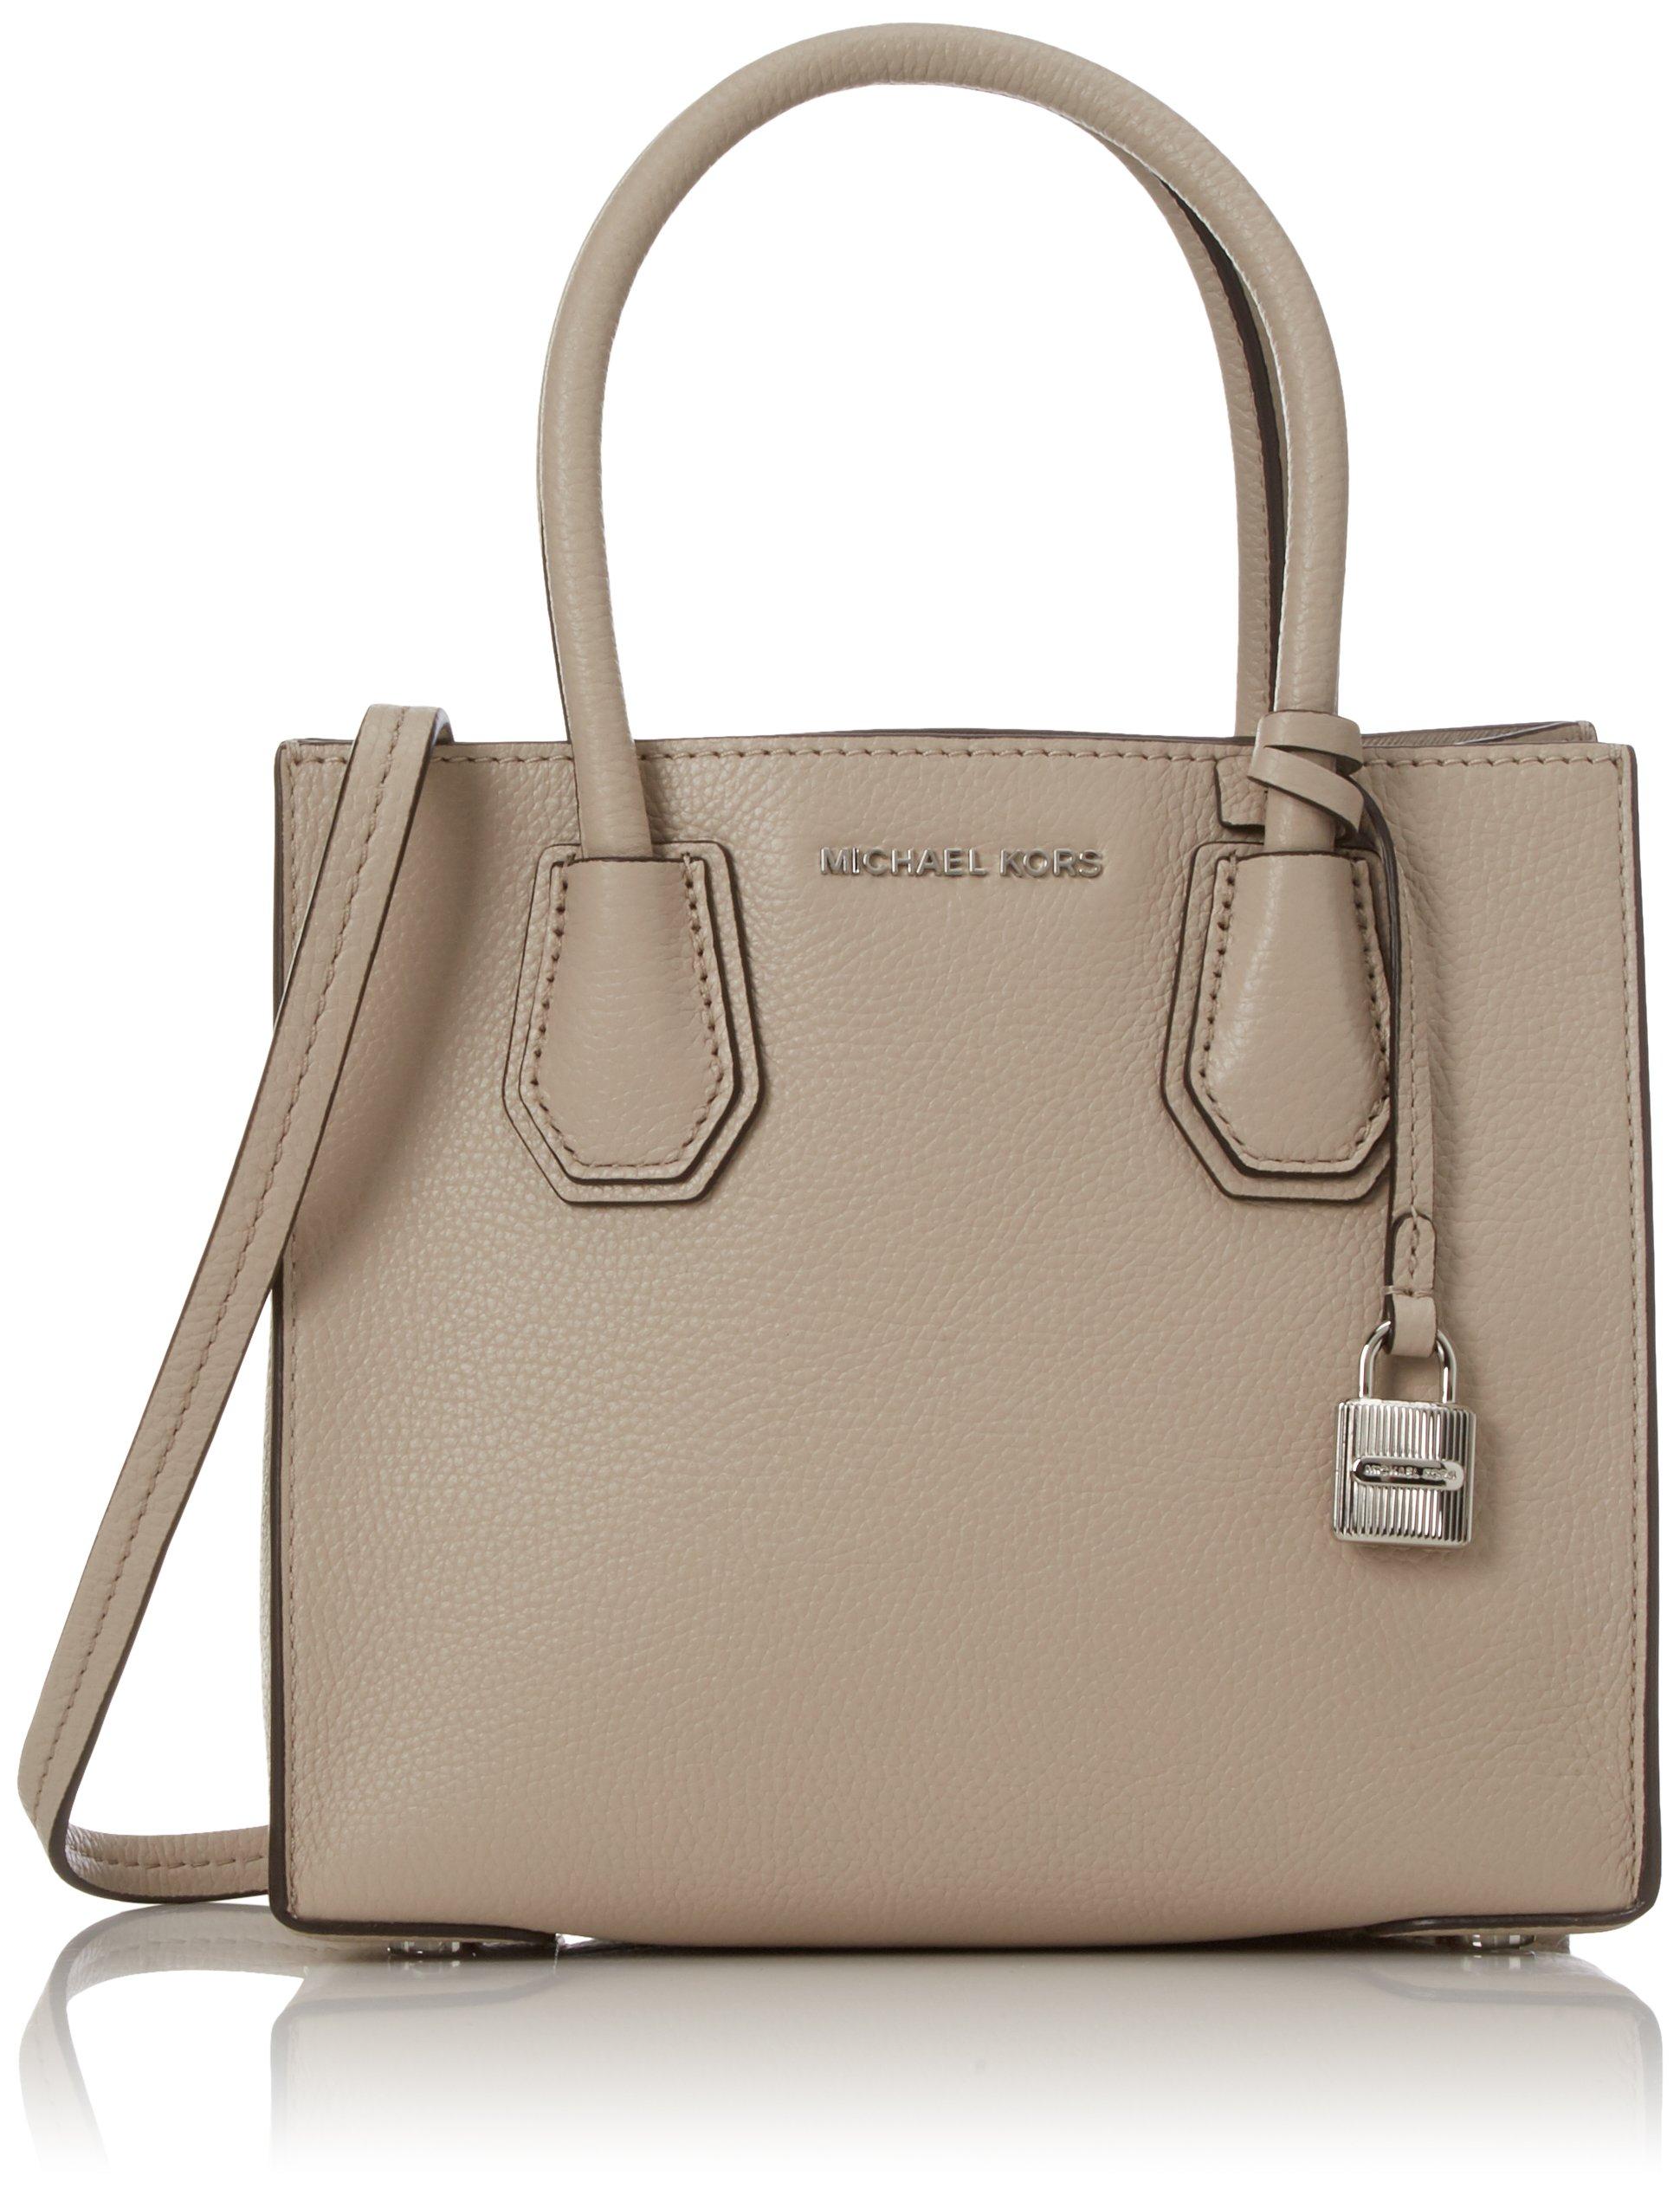 Michael Kors Women's Medium Mercer Bonded Leather Tote Shoulder Bag - Cement